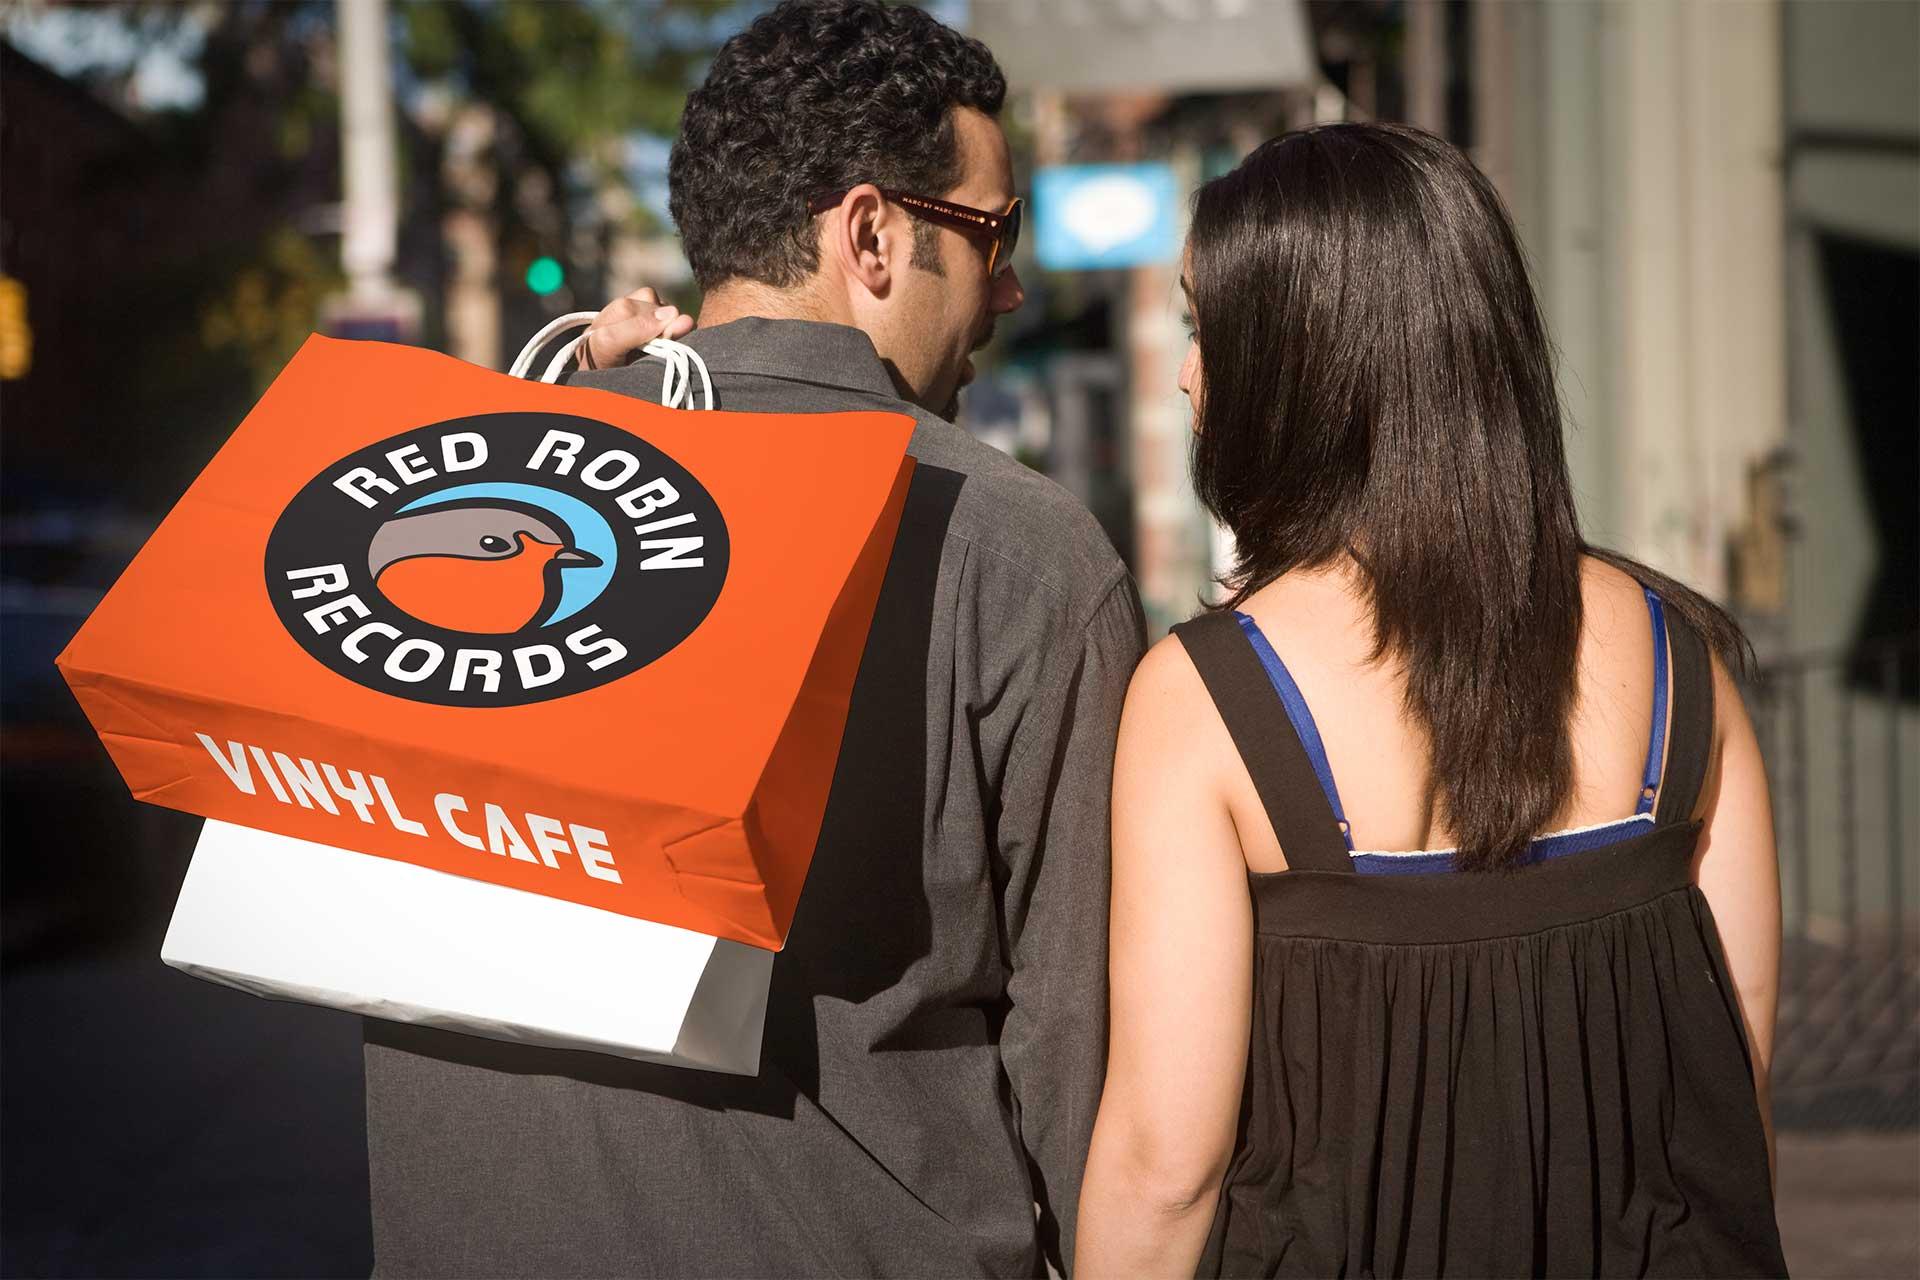 Logo Design for Vinyl Cafe, Red Robin Records presented on a bag.